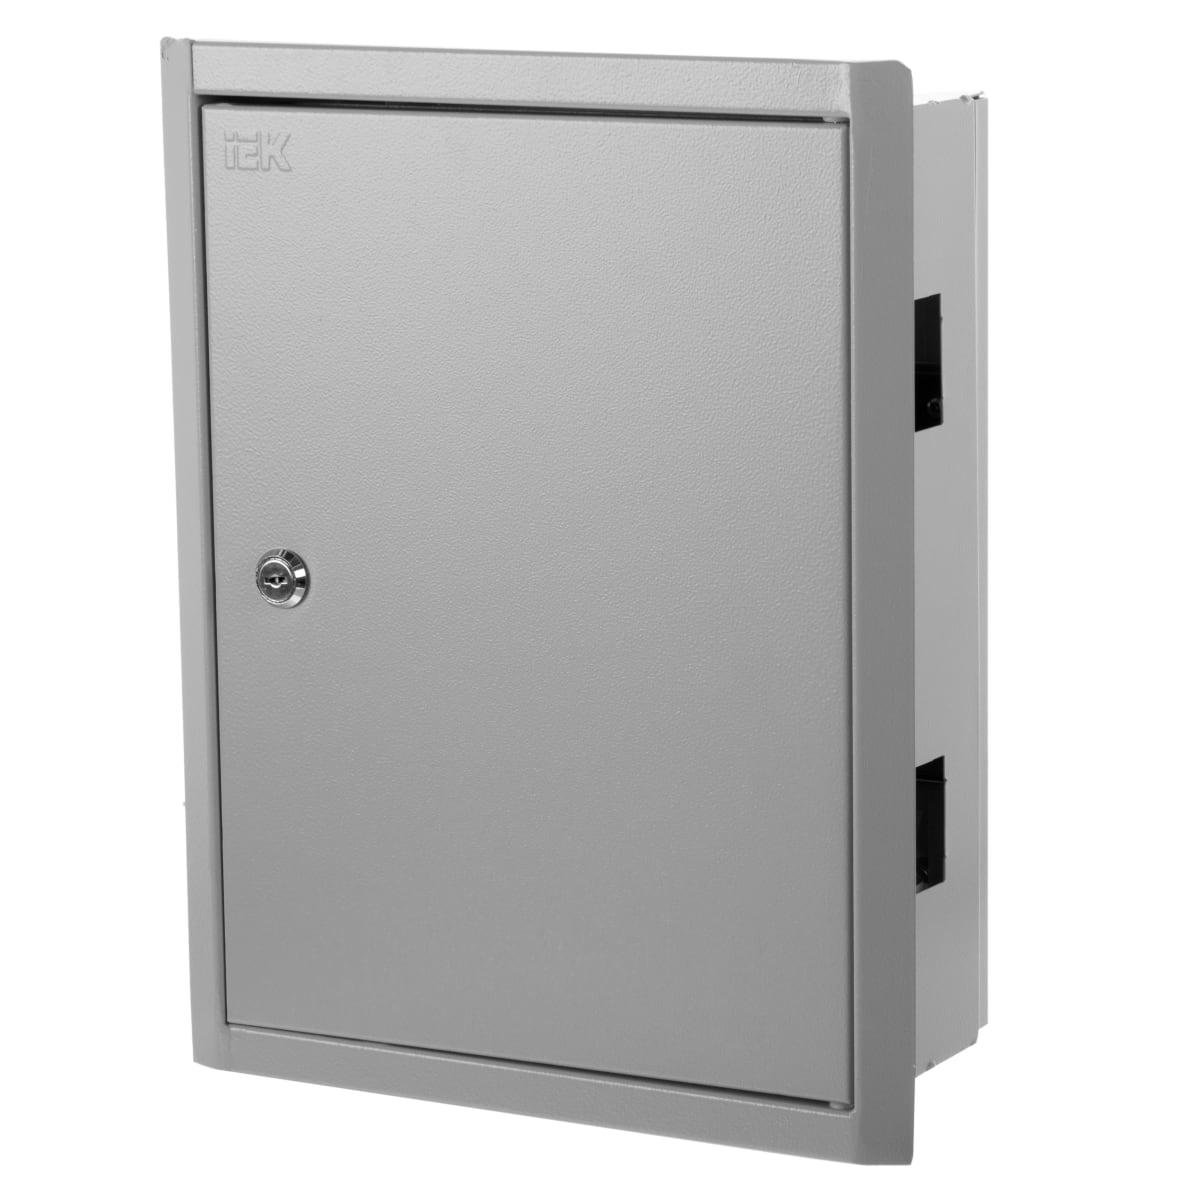 Щит металлический IEK ЩРв-24з на 24 модулей, IP30